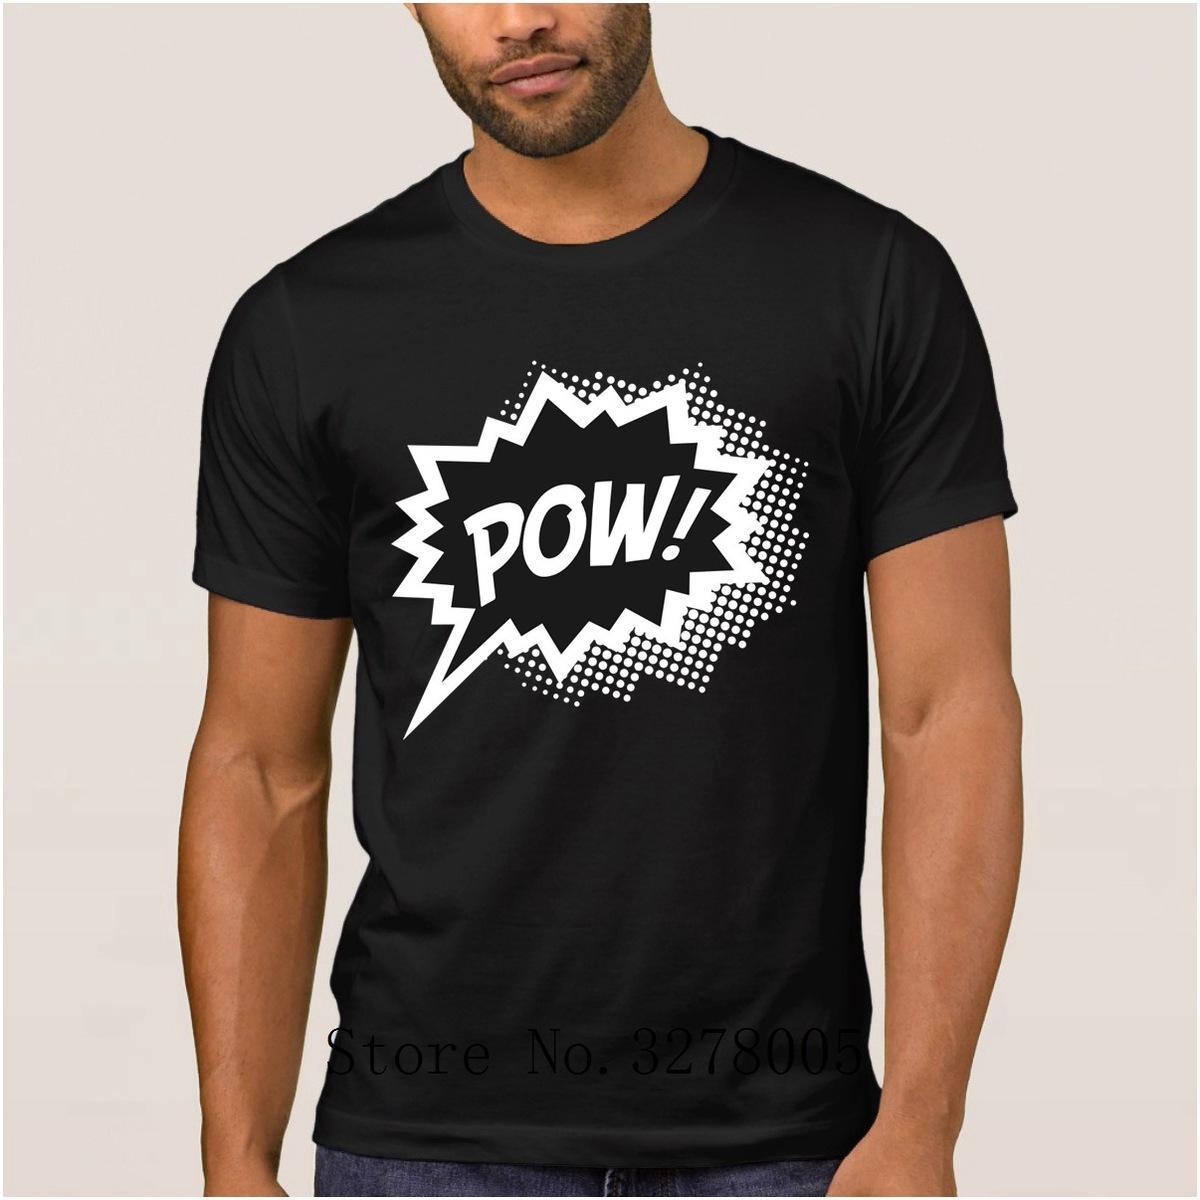 Pow Tee Fun Regalo Speech Cartoon Summer Shirt Bubble Comic Superhéroe Hombre Cotton Camiseta Streetwear Crazy Style lF1K3cTJ